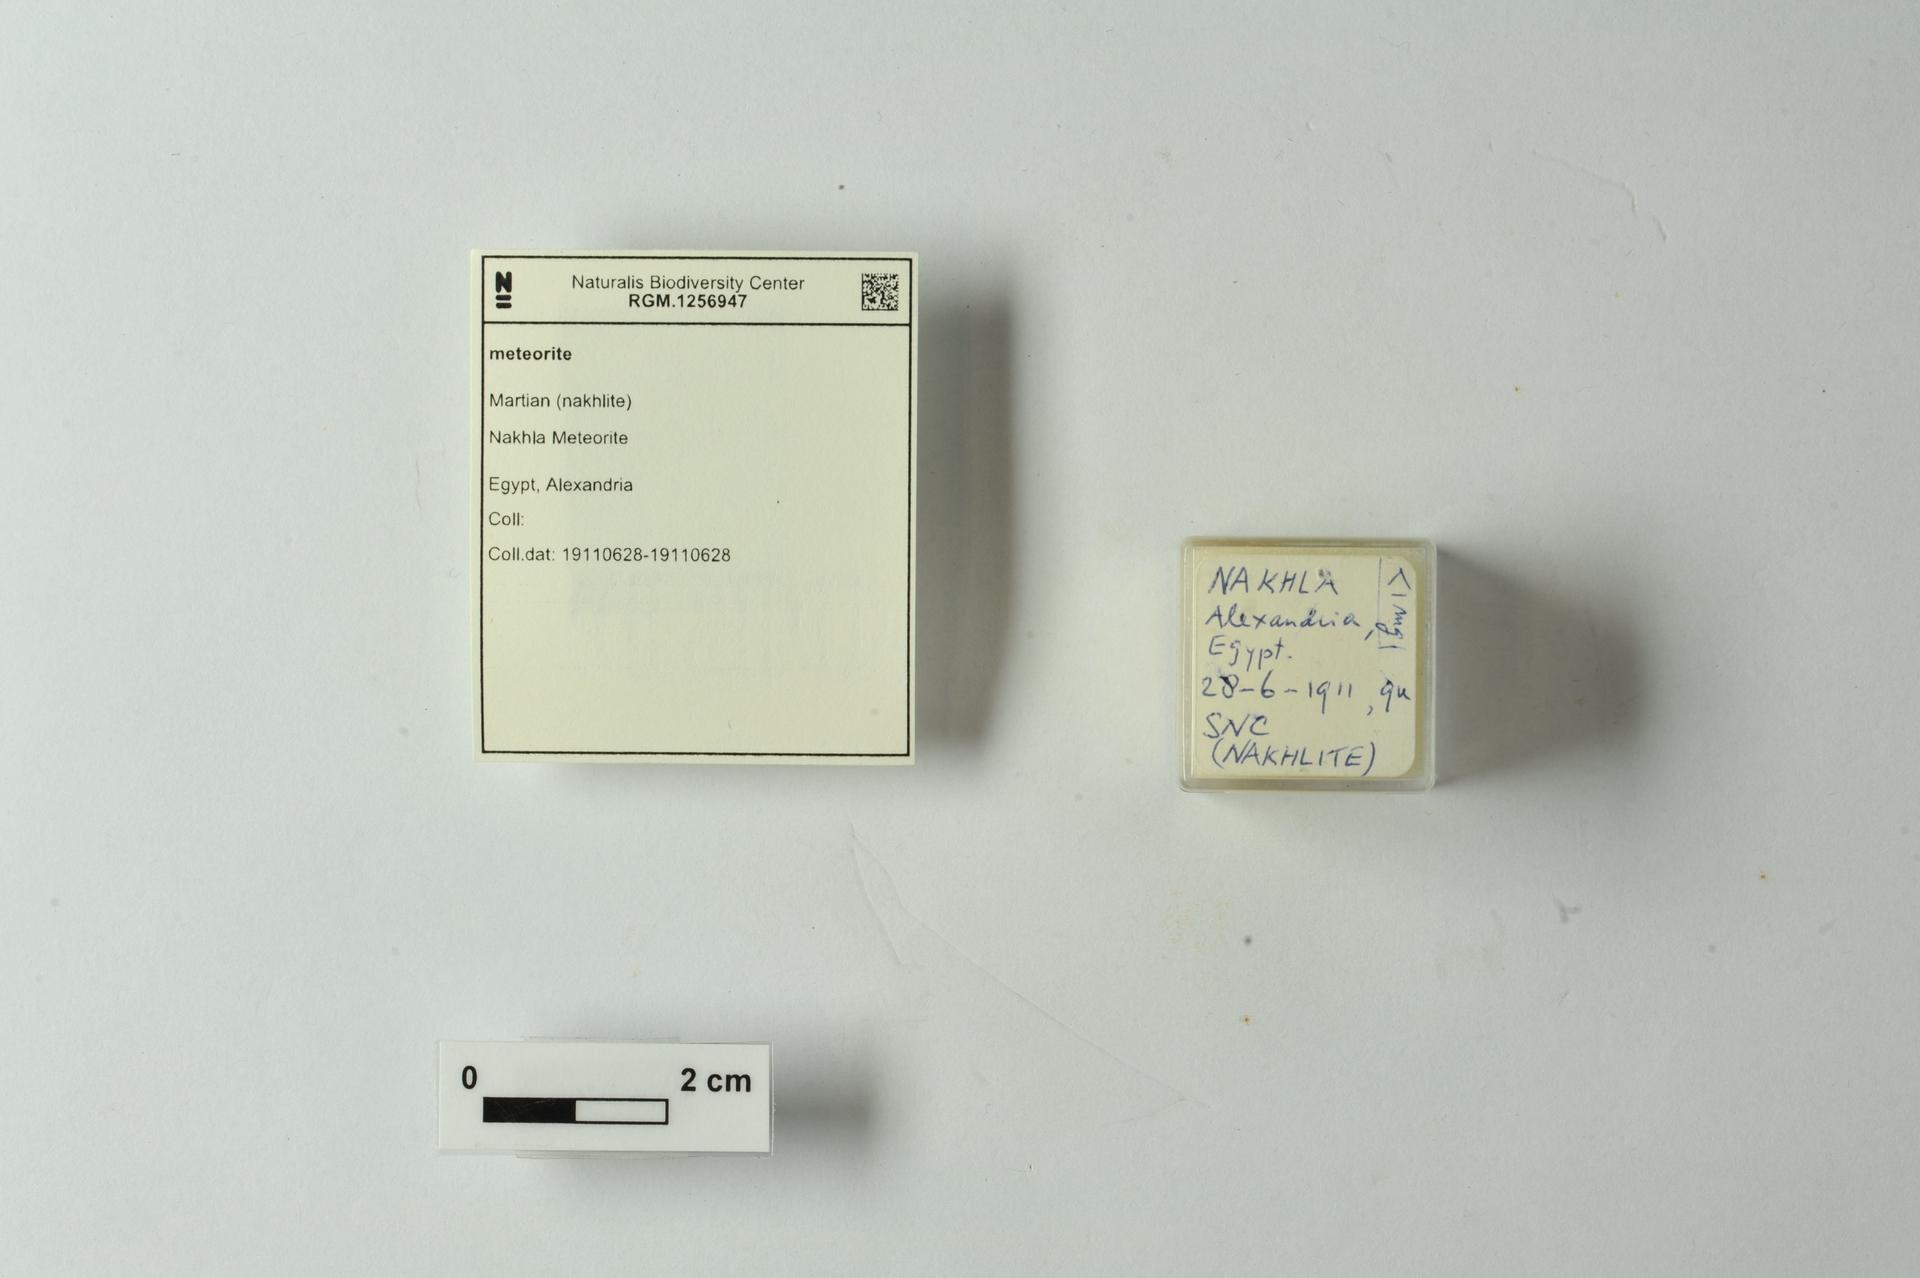 RGM.1256947   Martian (nakhlite)